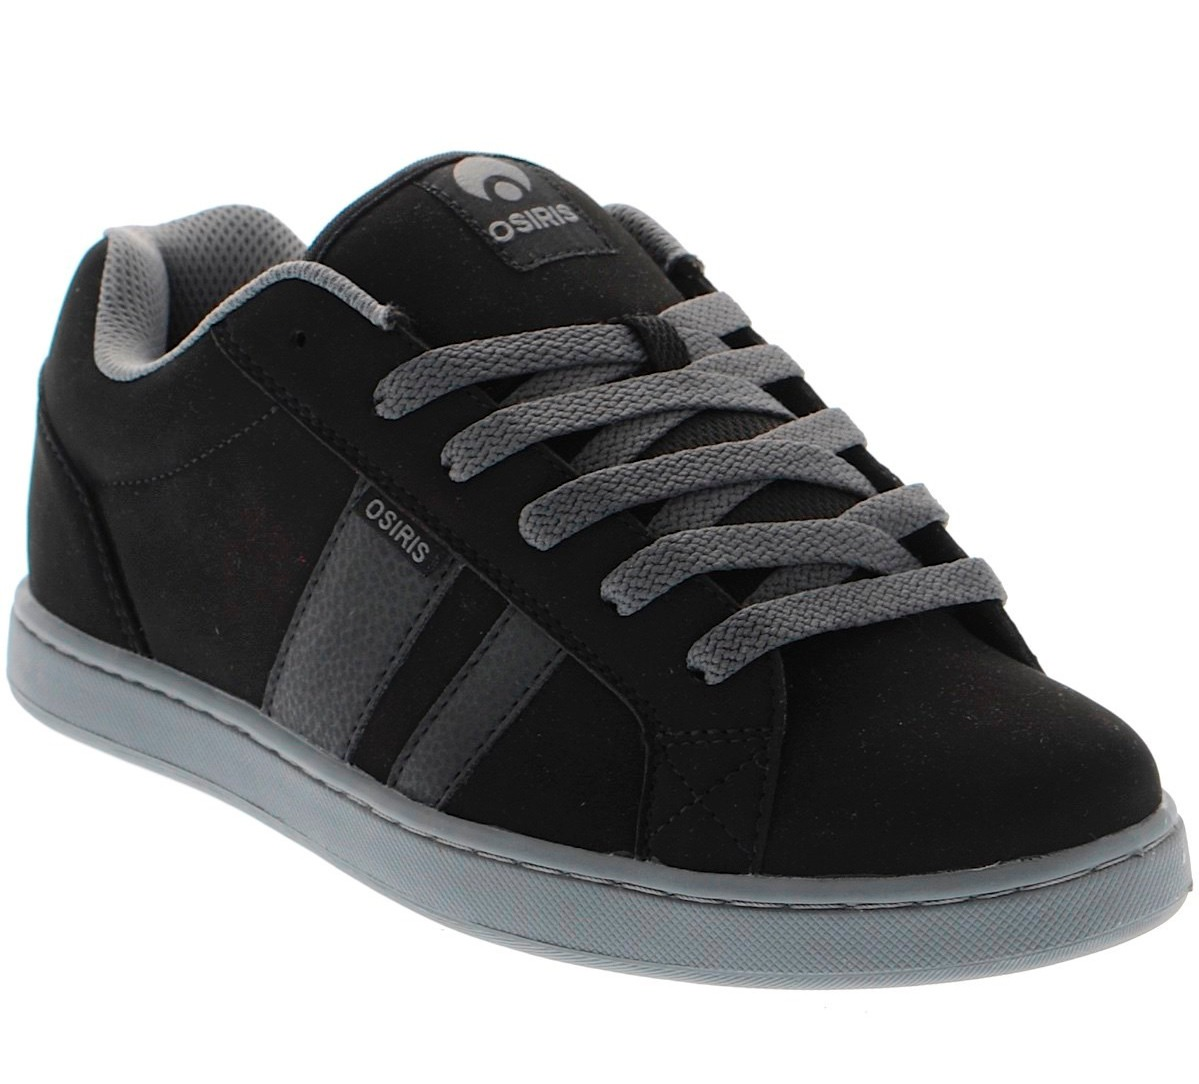 Skates For Shoes